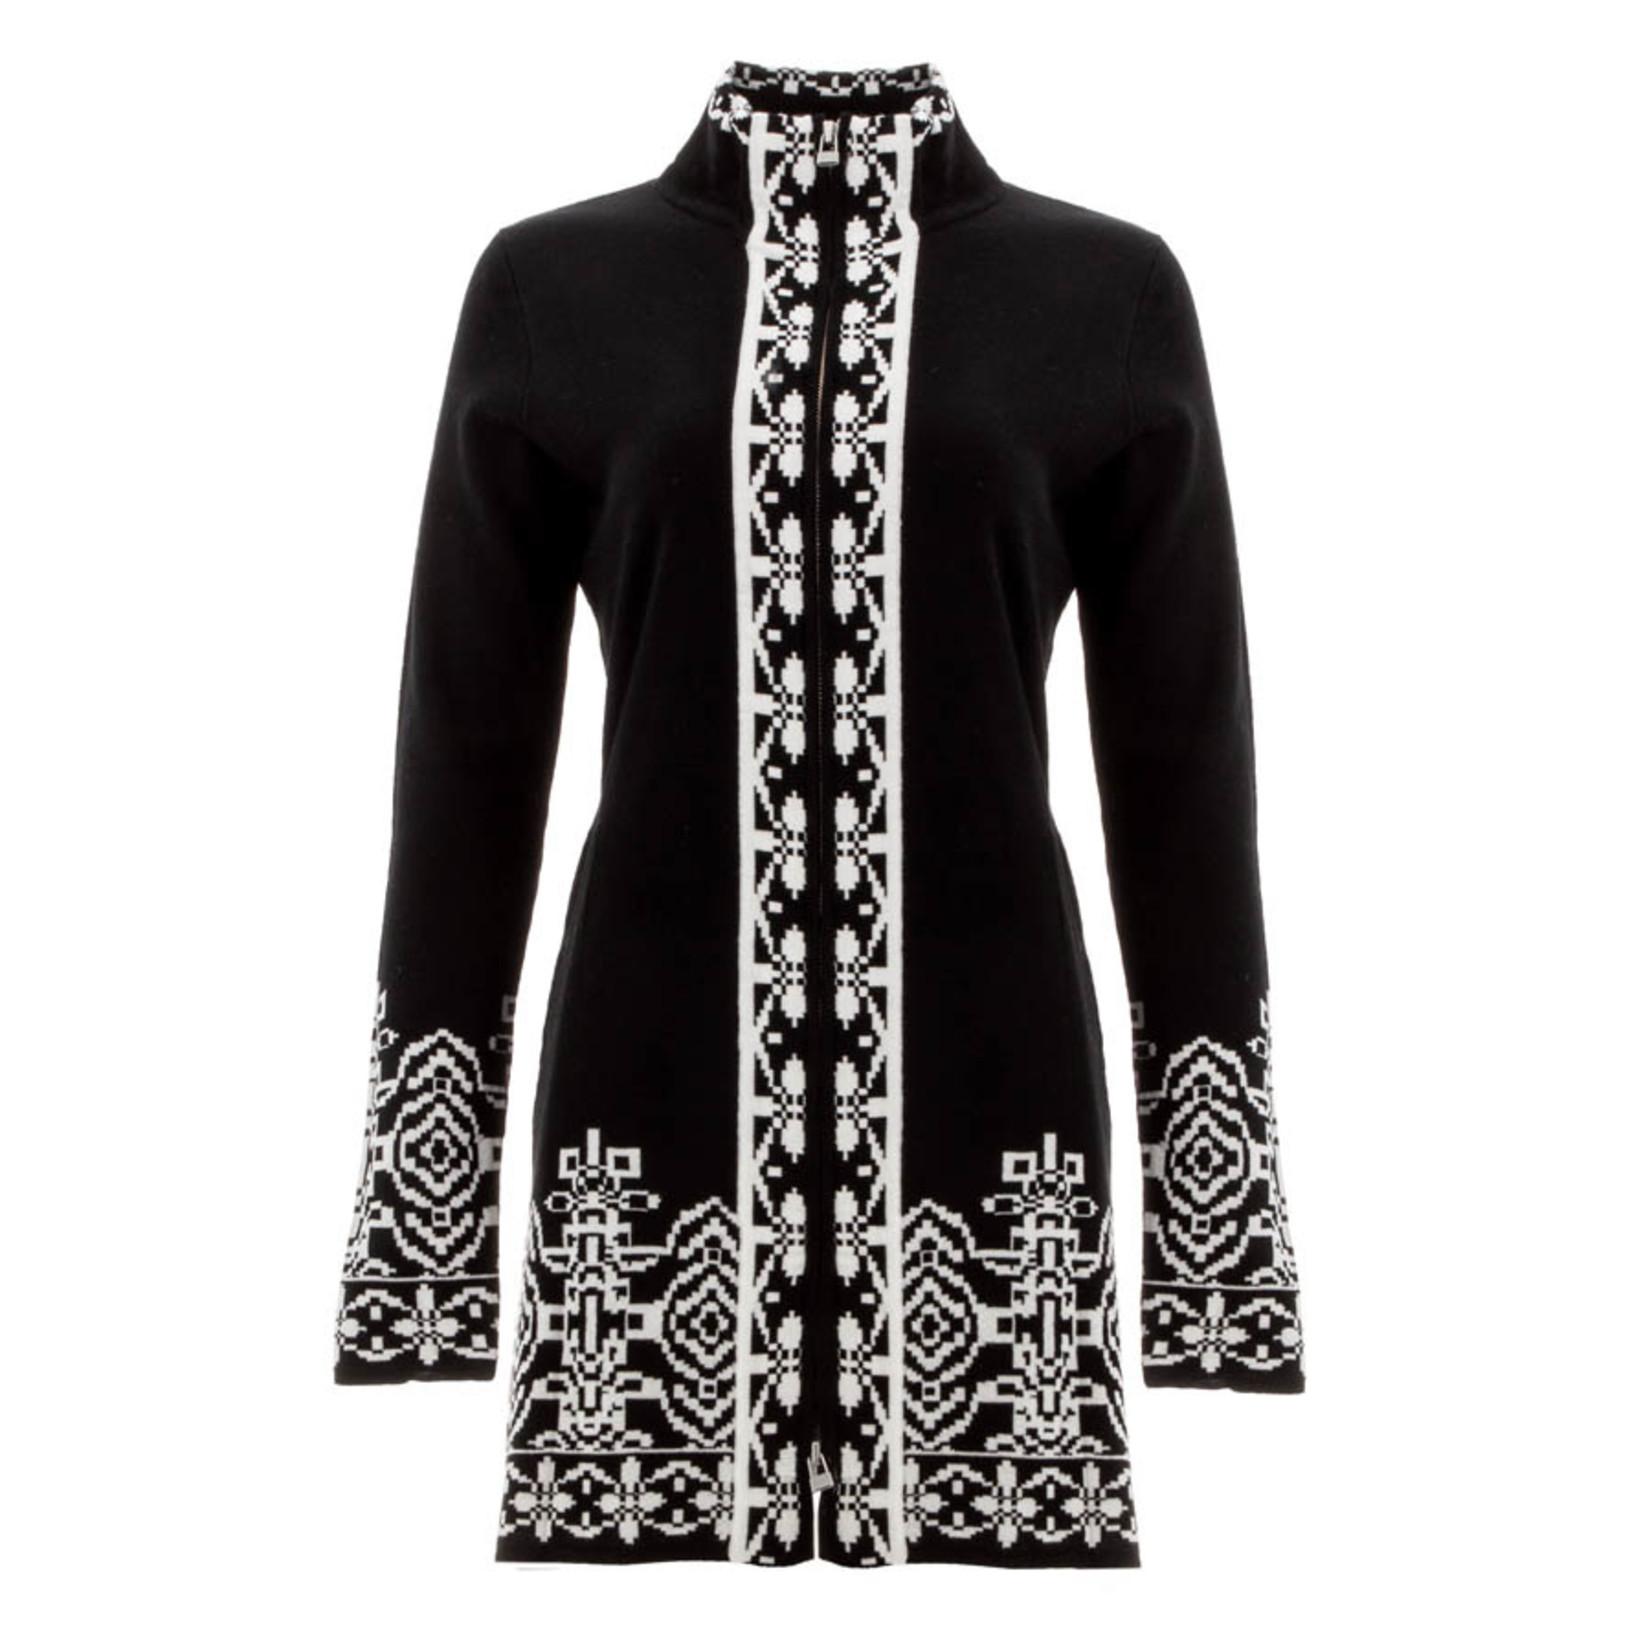 Icelandic Sweater/Long/FullZip/Black/WhitePattrnTrim/HiddnSidPkts/HighNeck